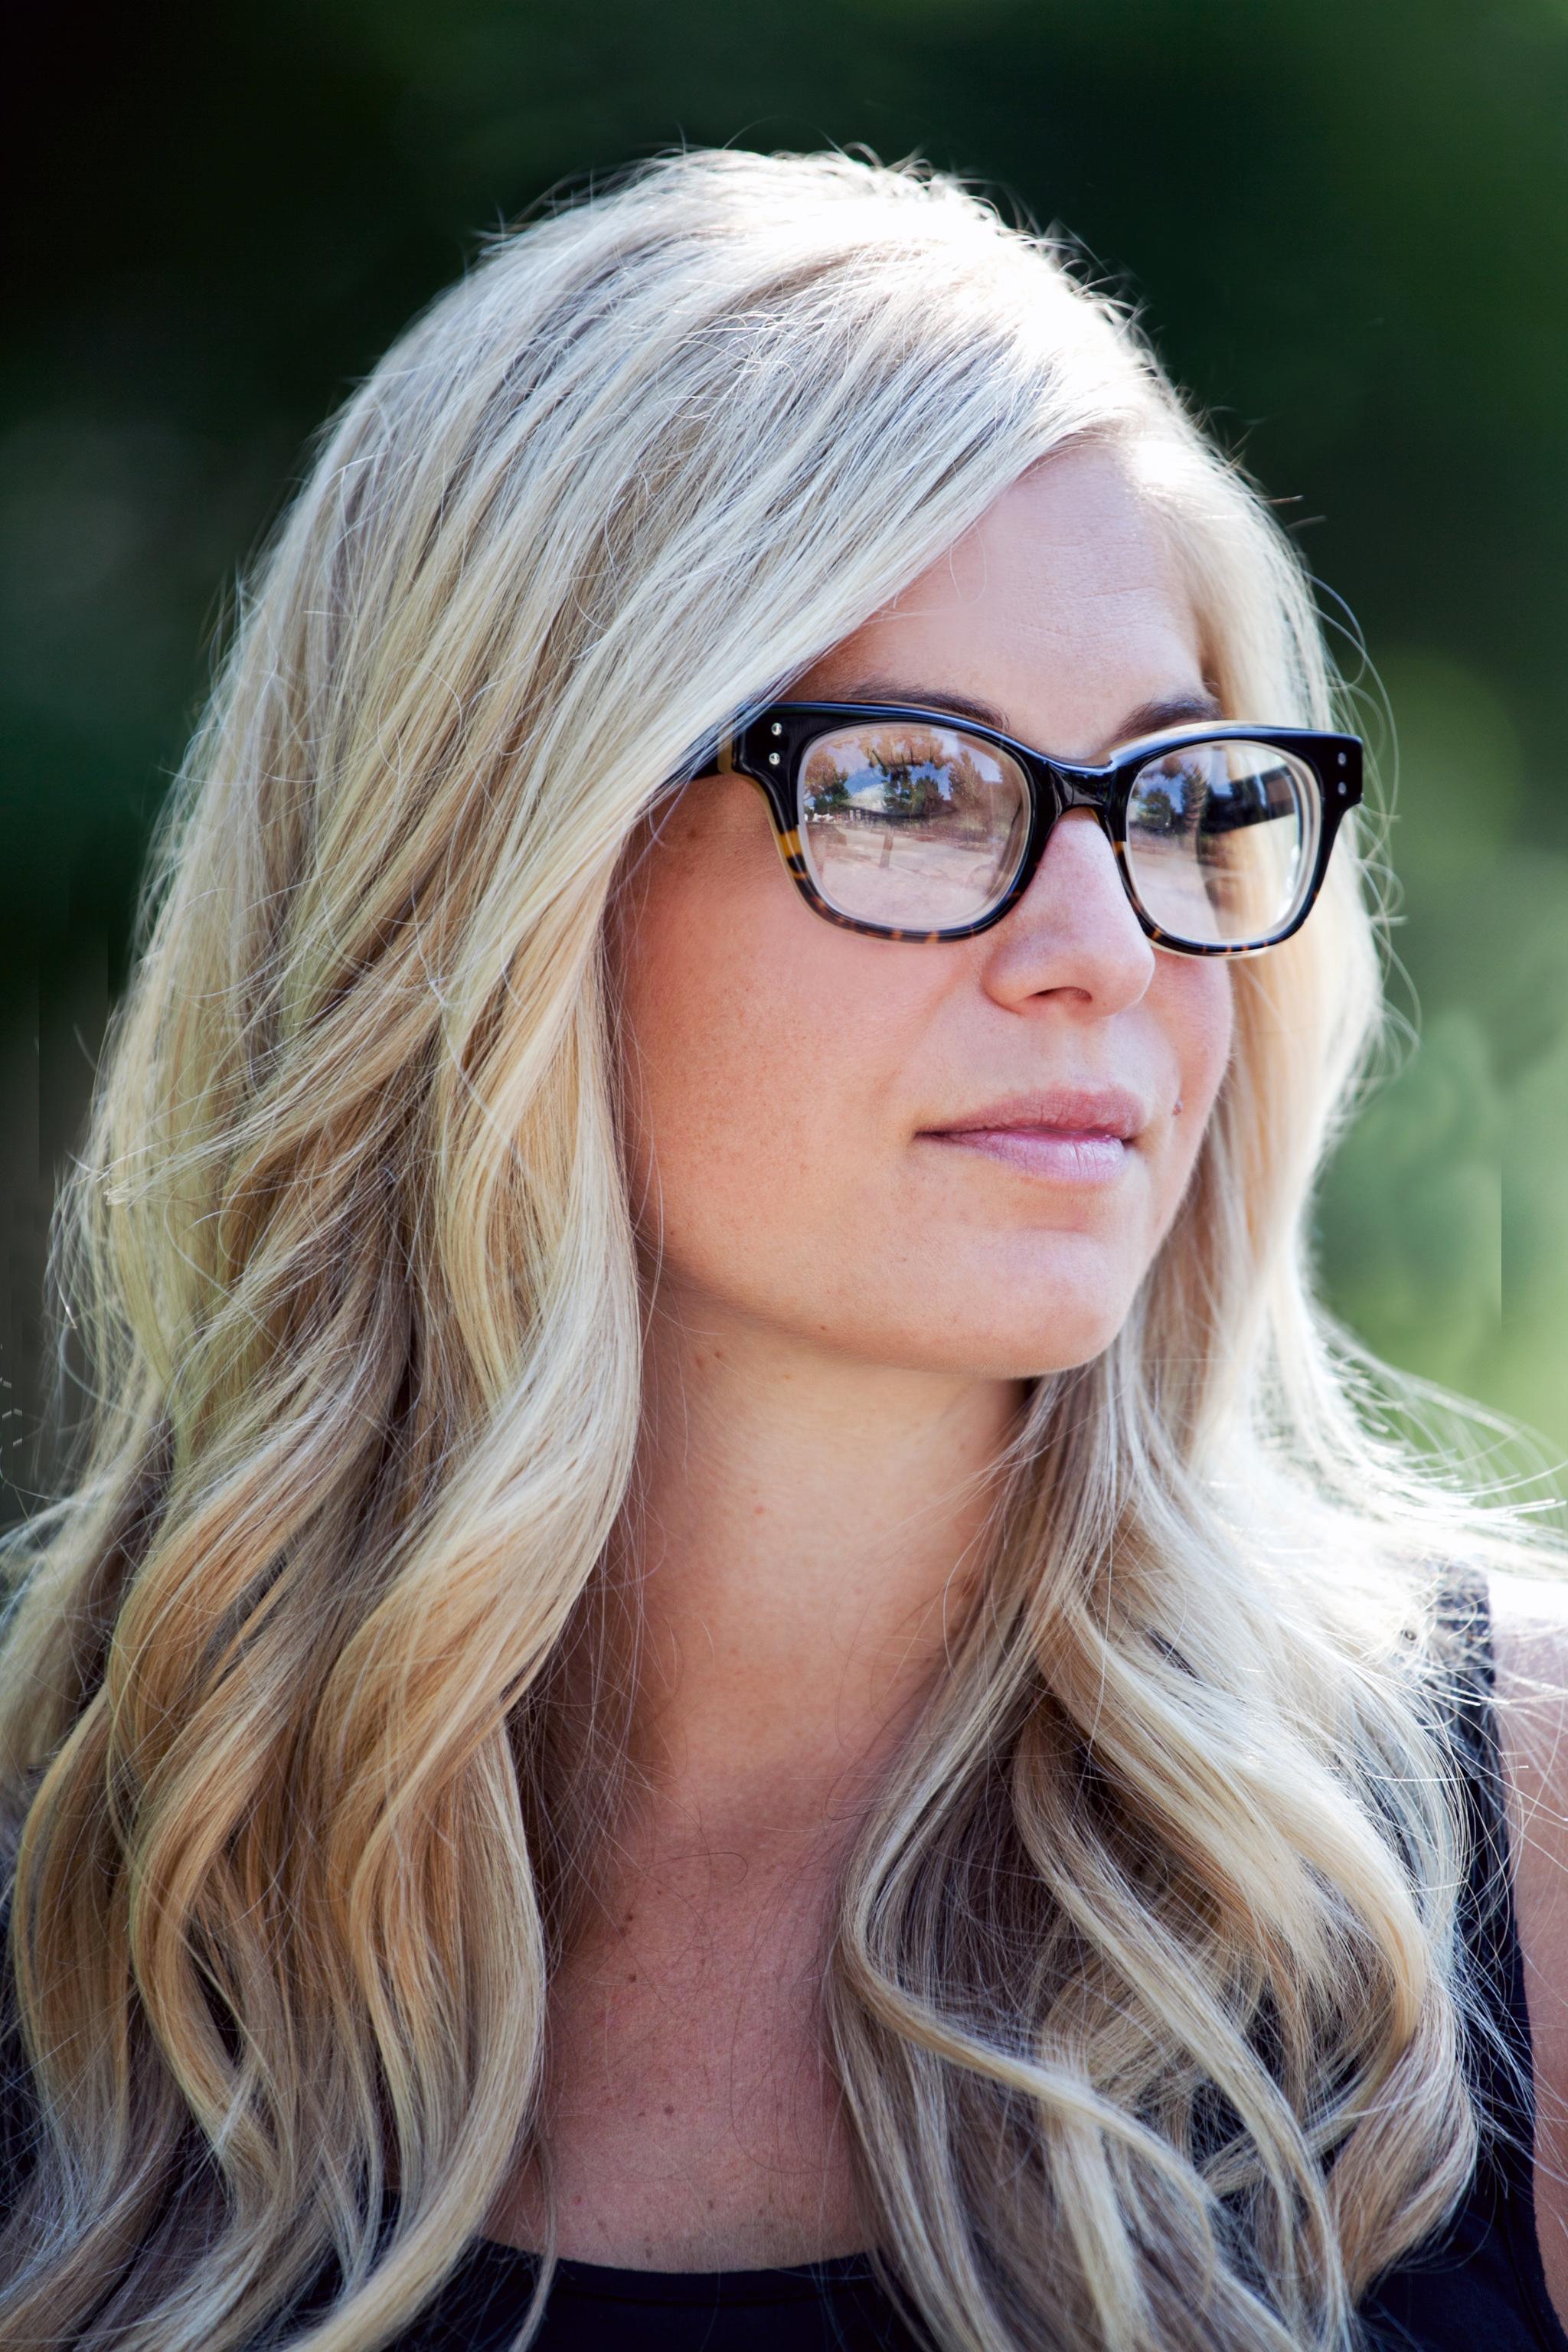 Patterns Amp Prints One Small Blonde Dallas Fashion Blogger